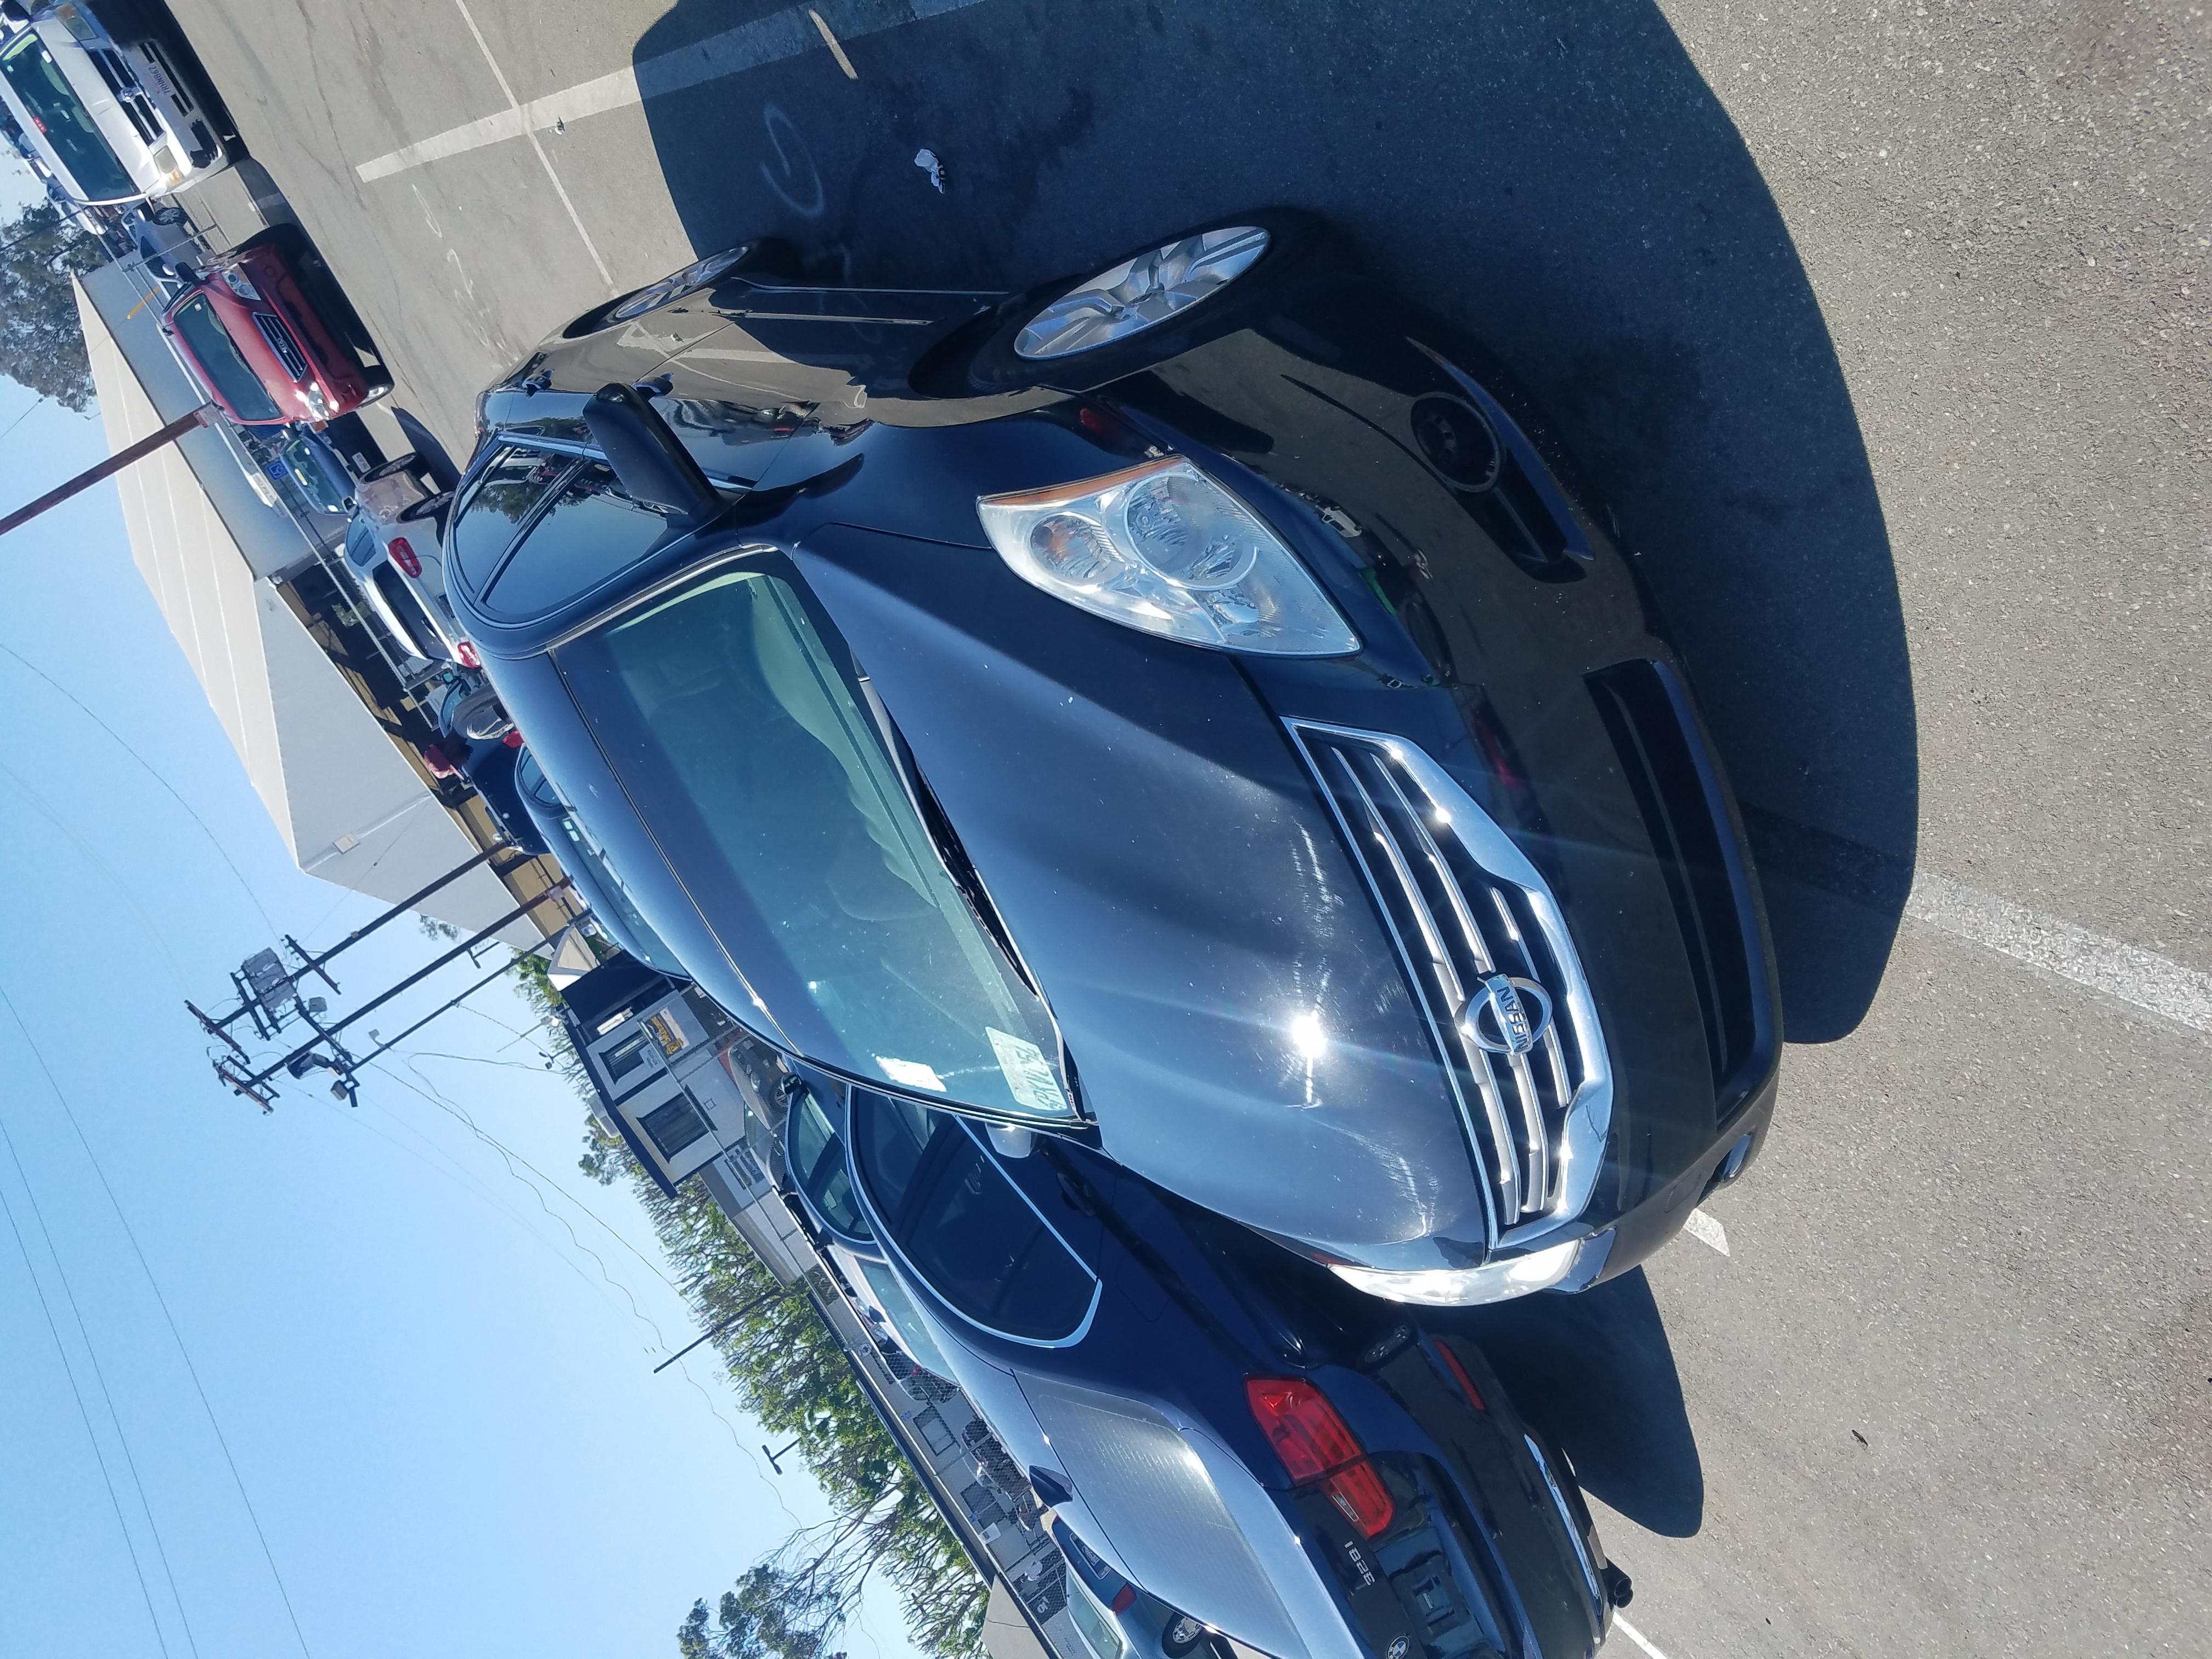 2012 Nissan Altima SE